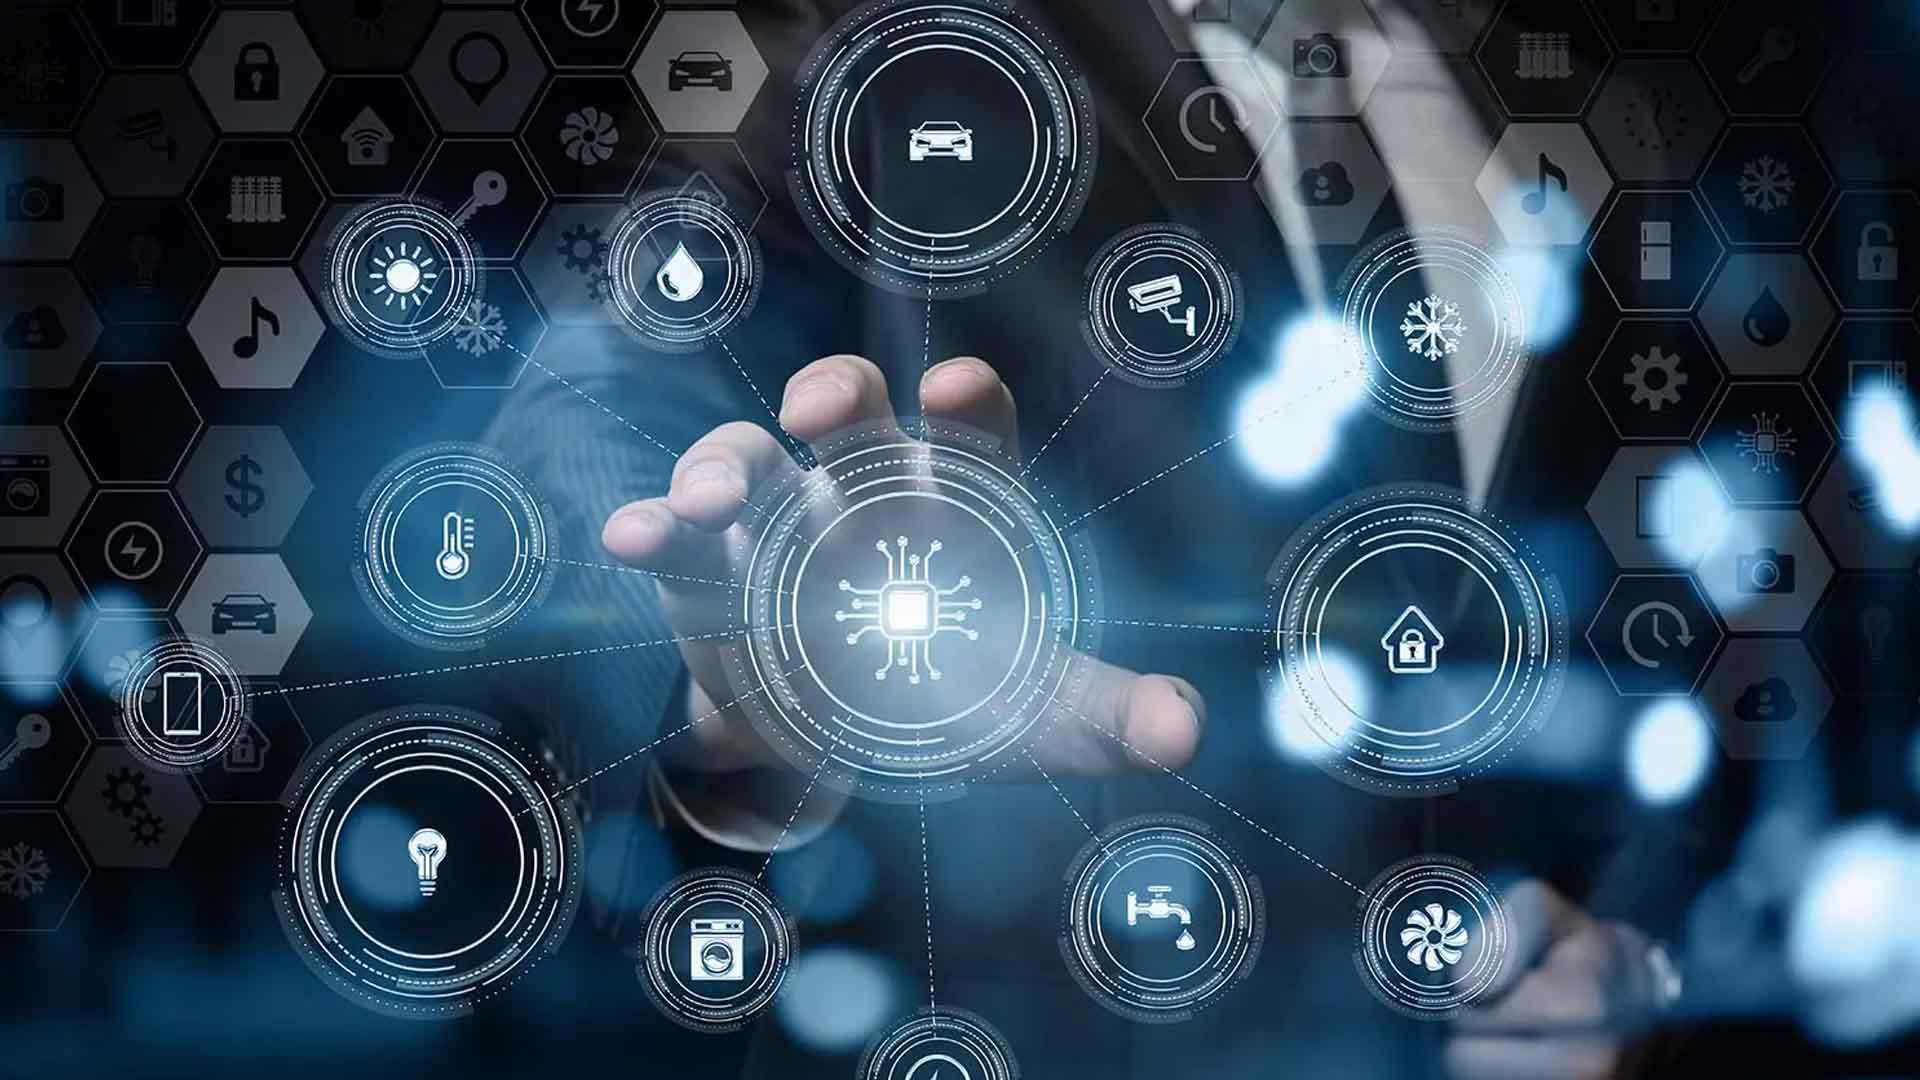 Trasformare la cyber security in opportunità di business: una visione imprenditoriale - Cyber Security 360